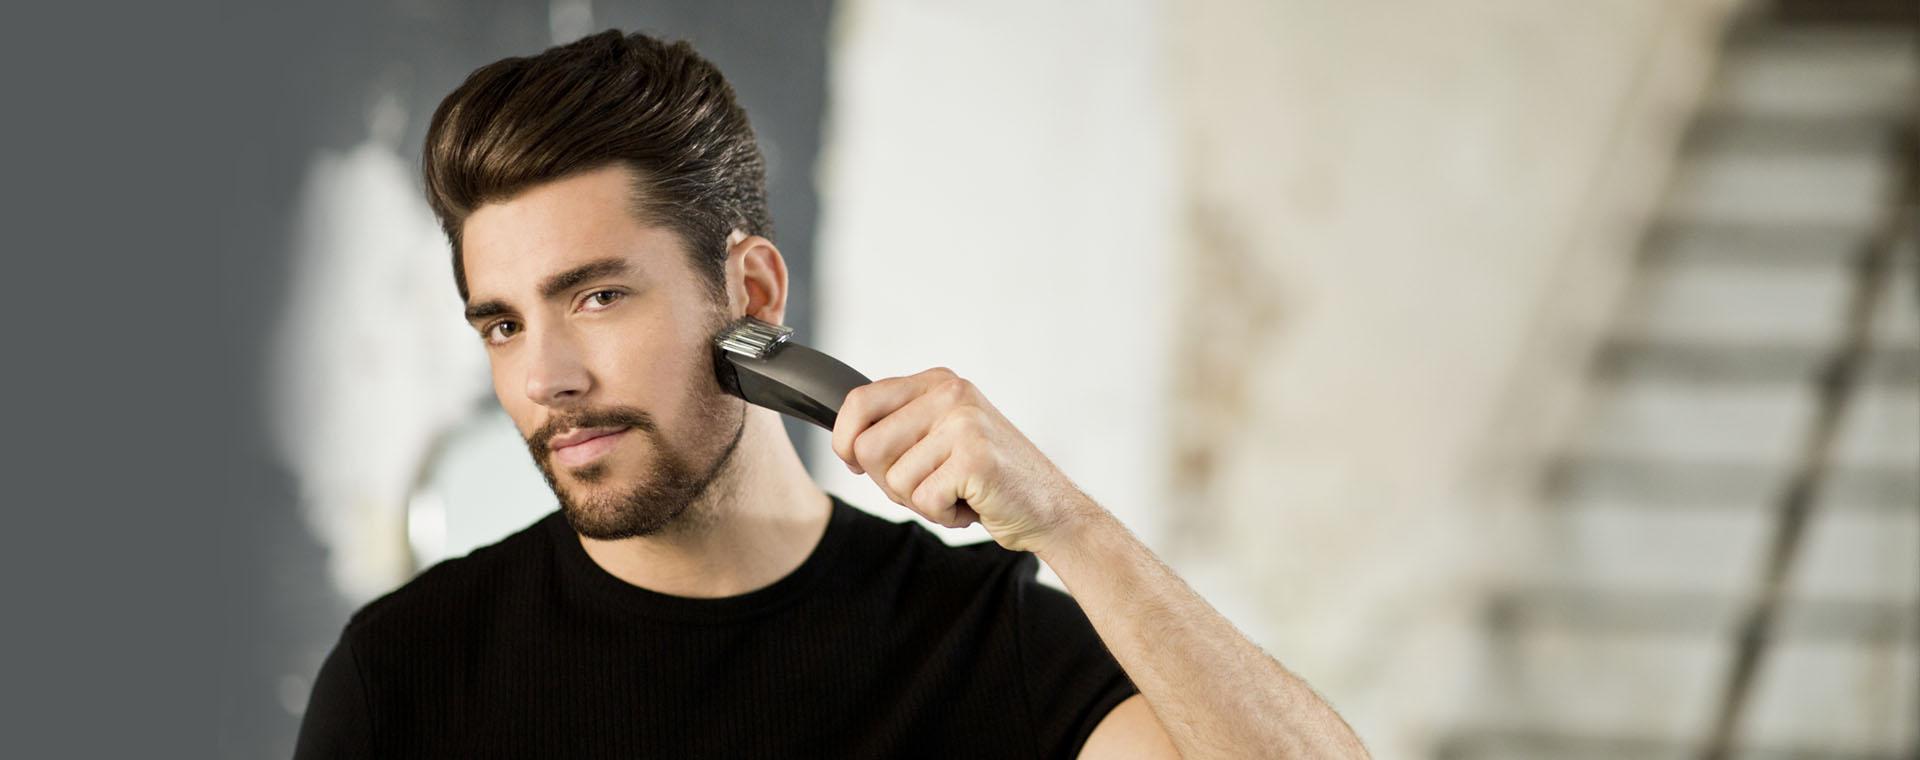 Beard Boss Beard Trimmer Mb4120 Remington Uk